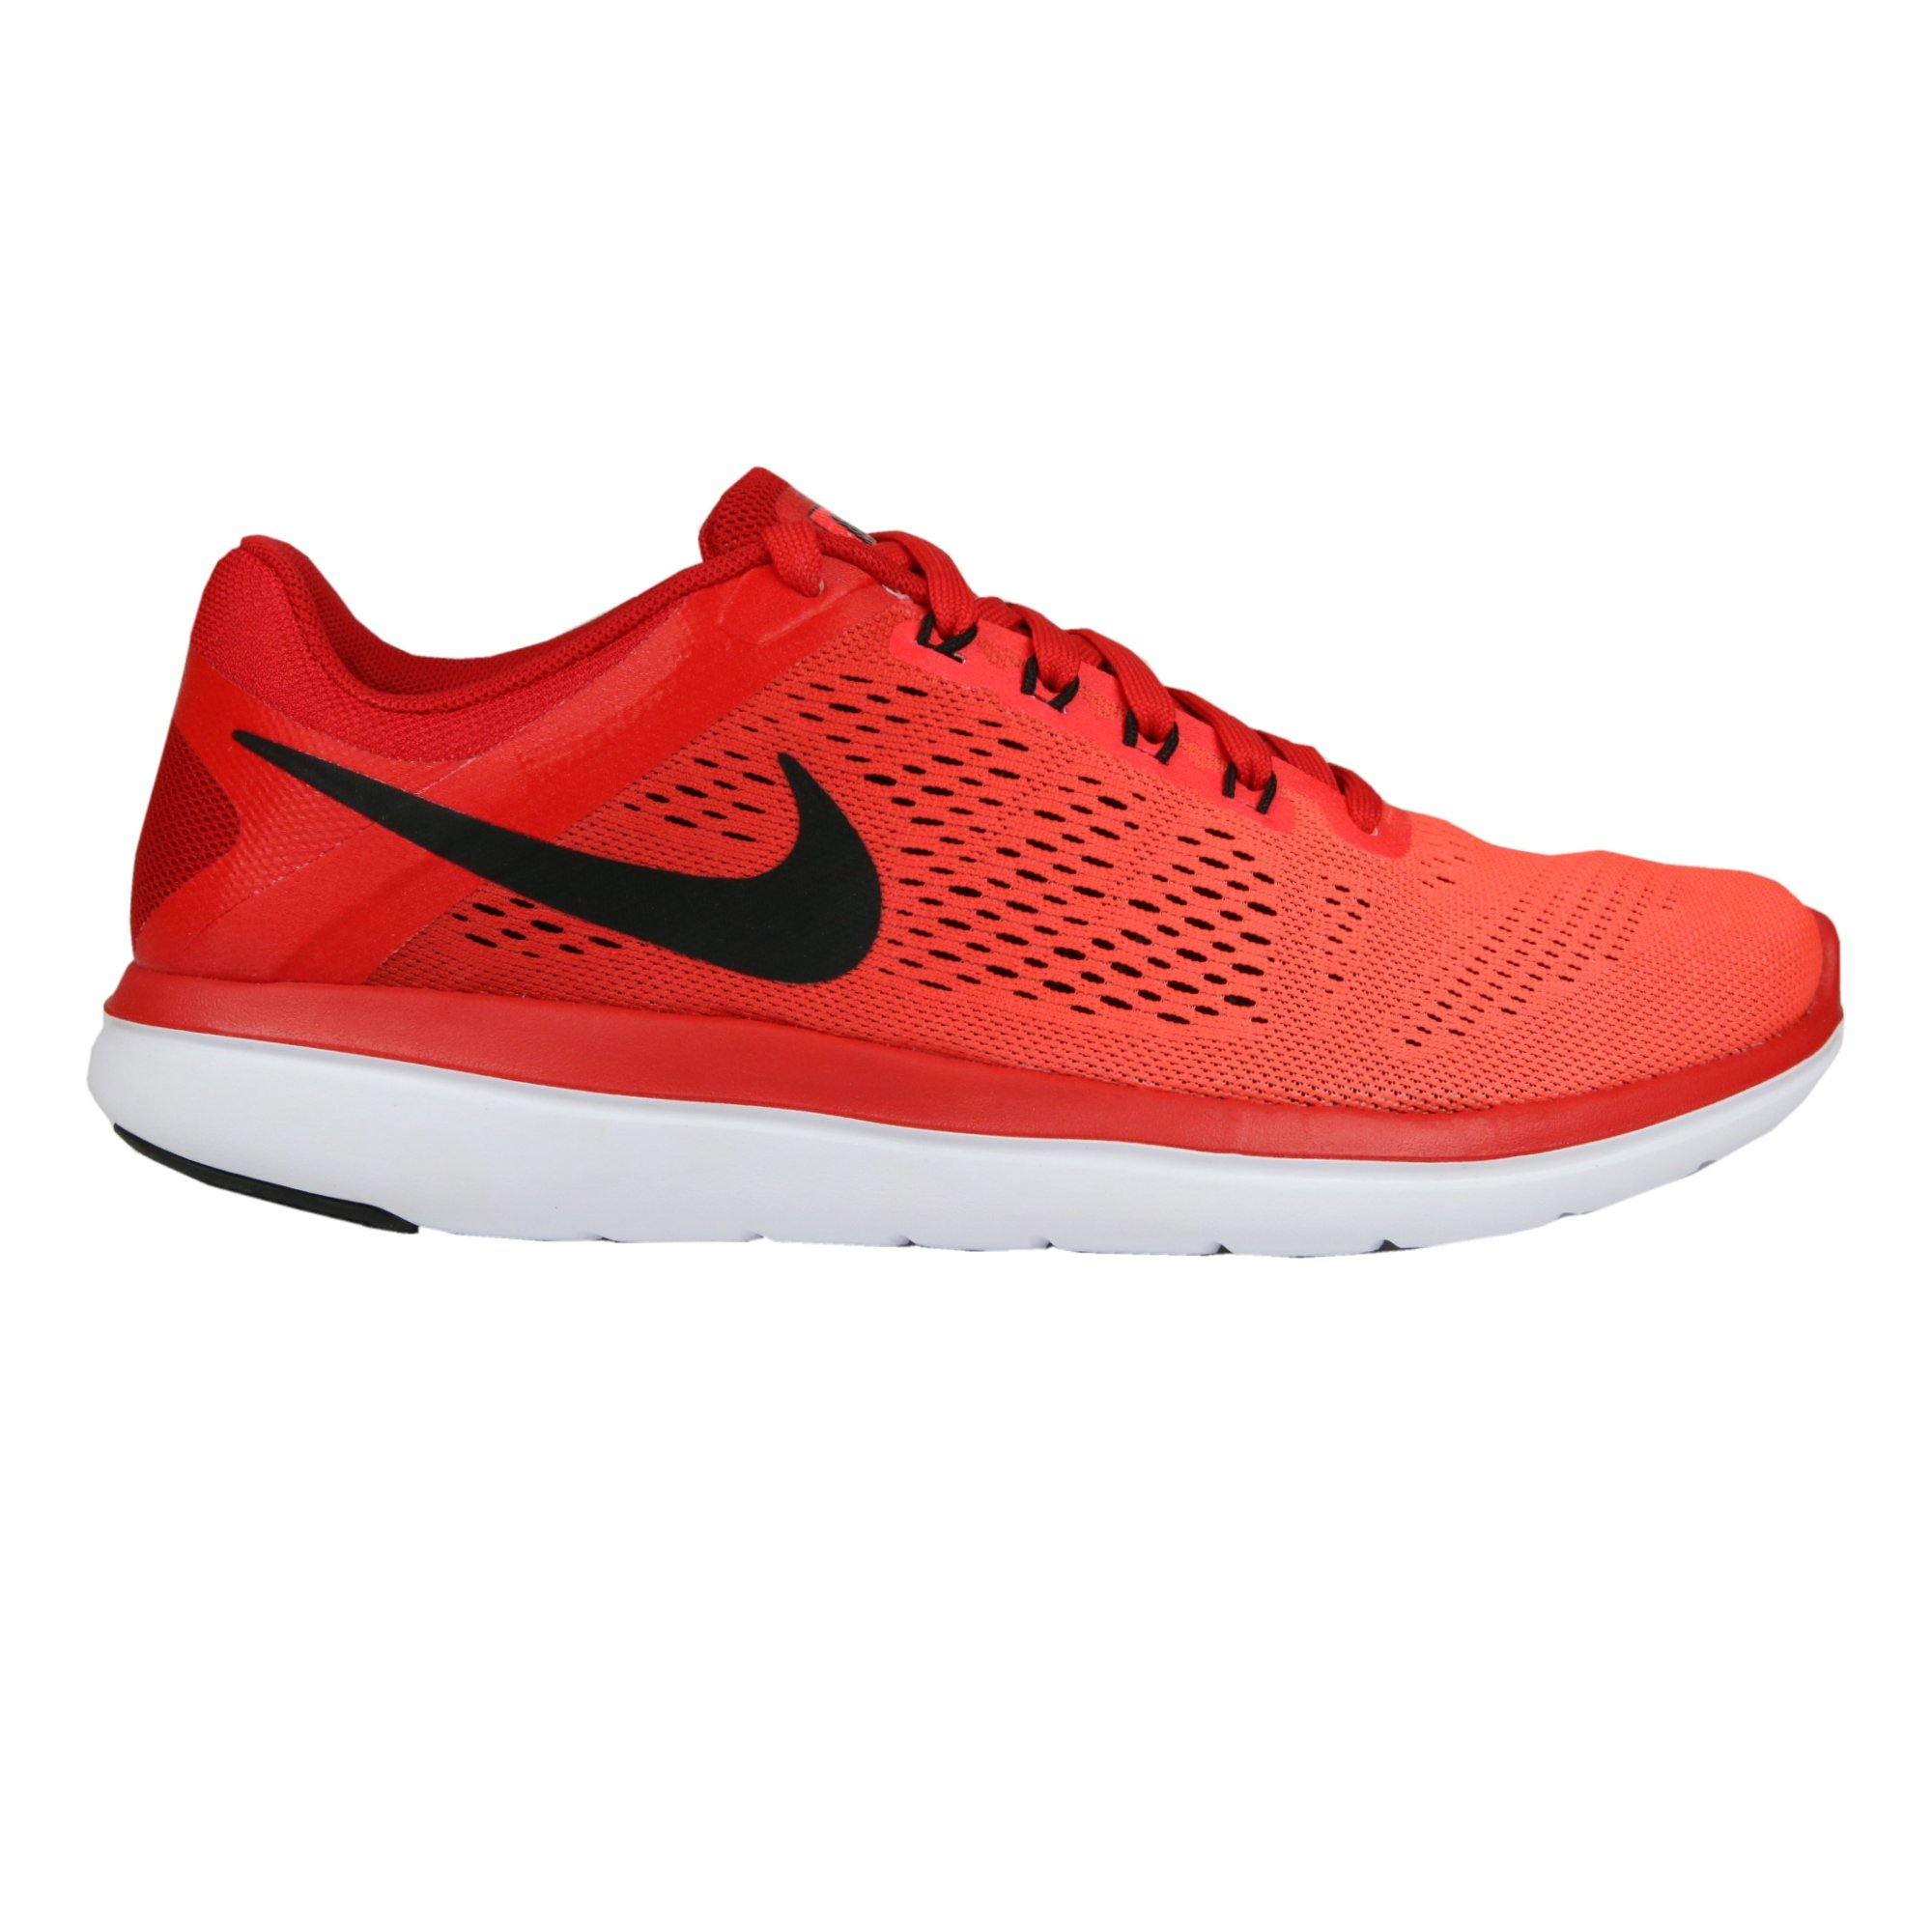 9da4db66a95fe Galleon - Nike Men's Flex 2016 Rn Running Shoes University Red ...